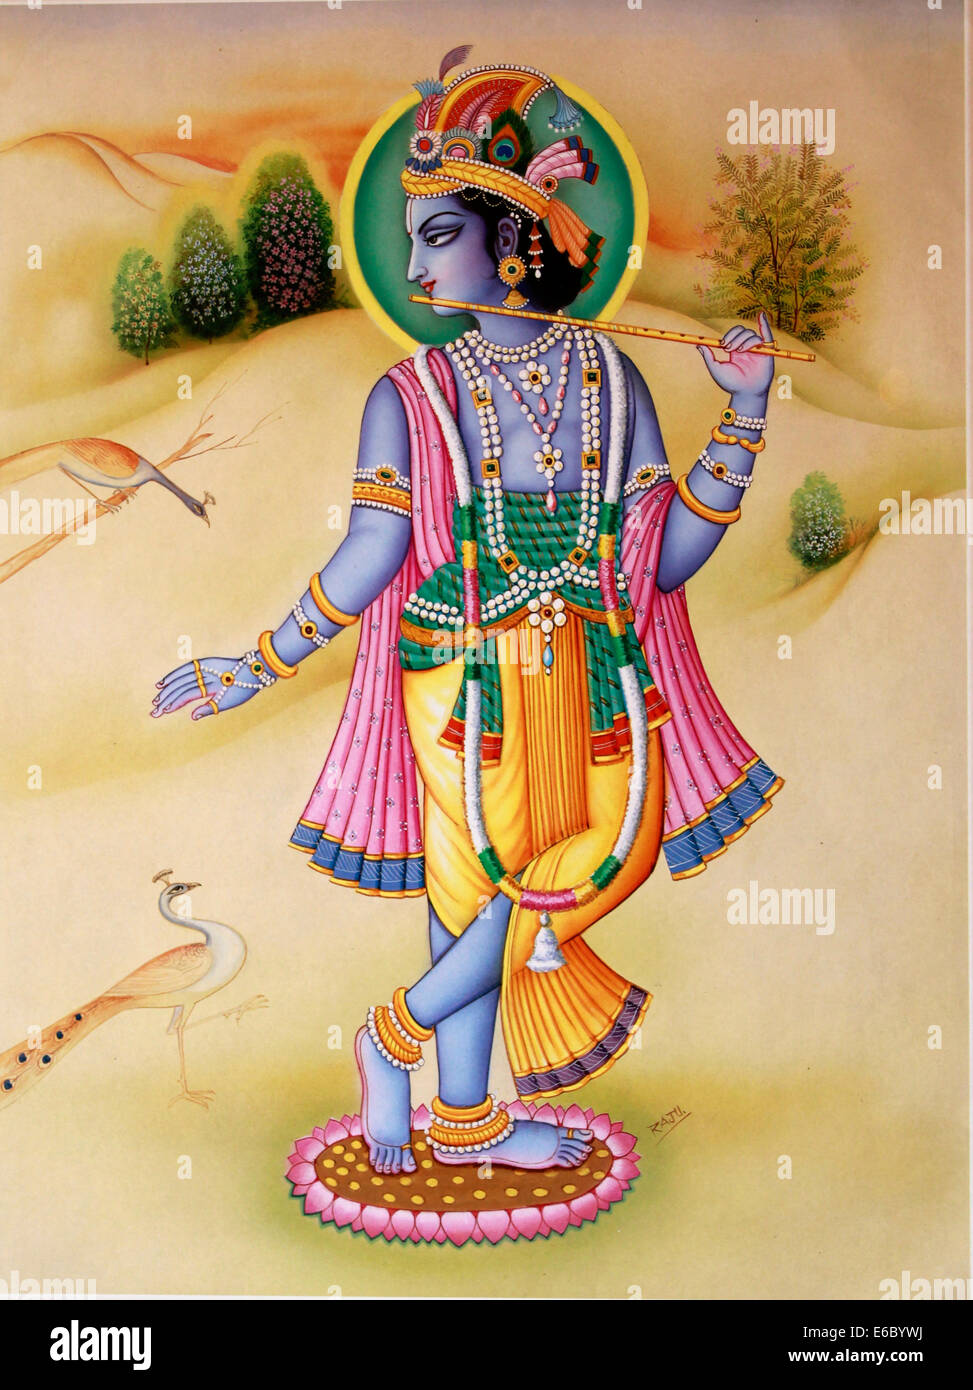 Lord Krishna With Gopis 3d Wallpaper Mural Painting Of Hindu God Krishna Stock Photo 72792766